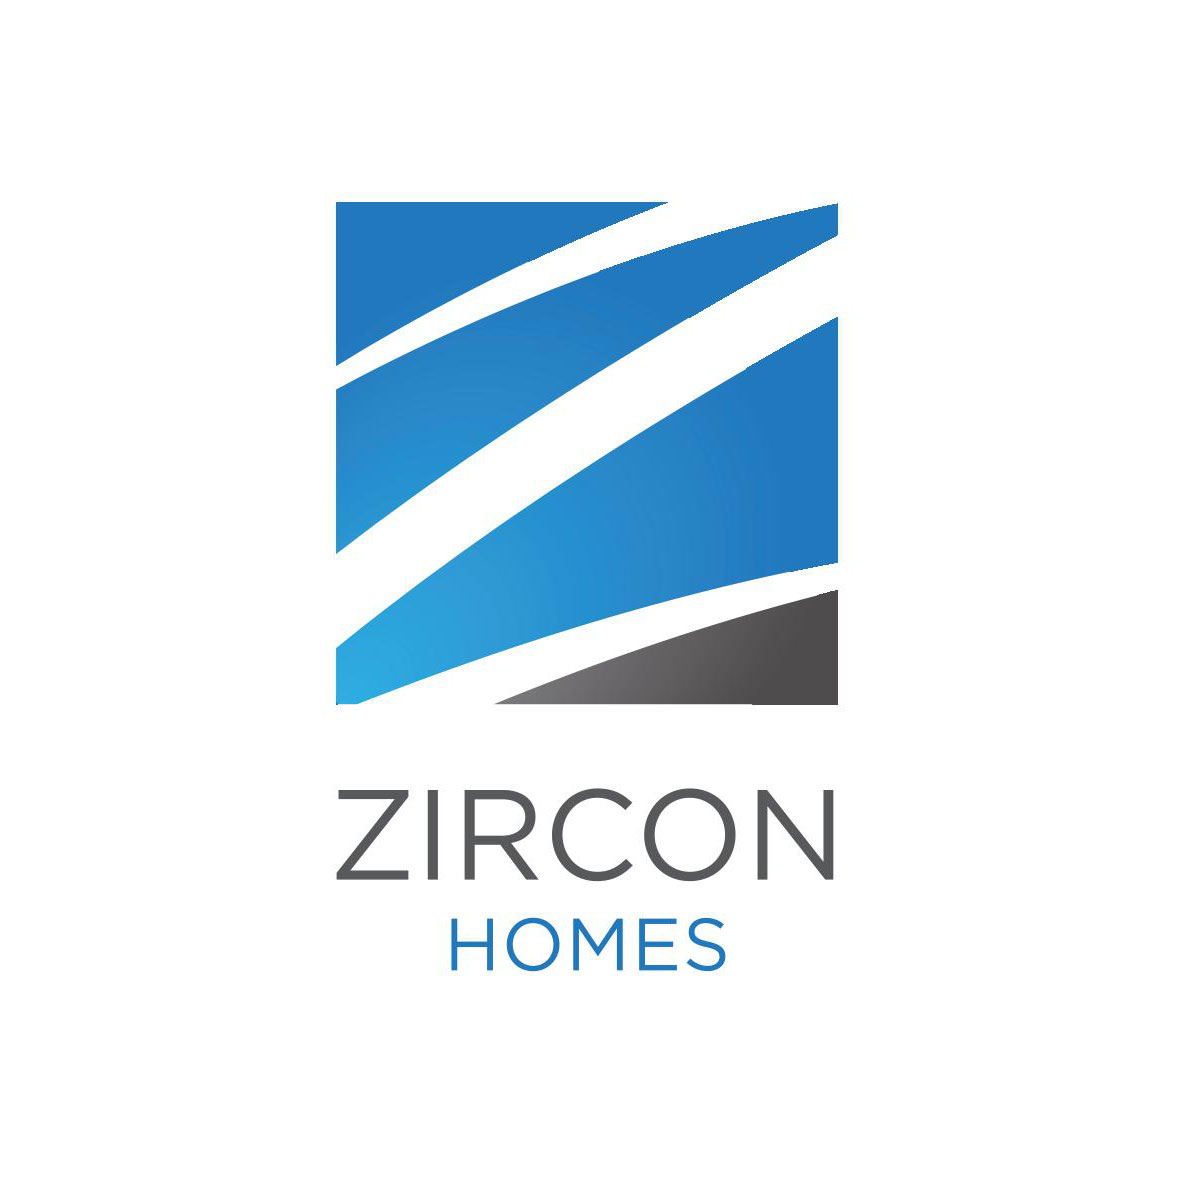 zircon homes